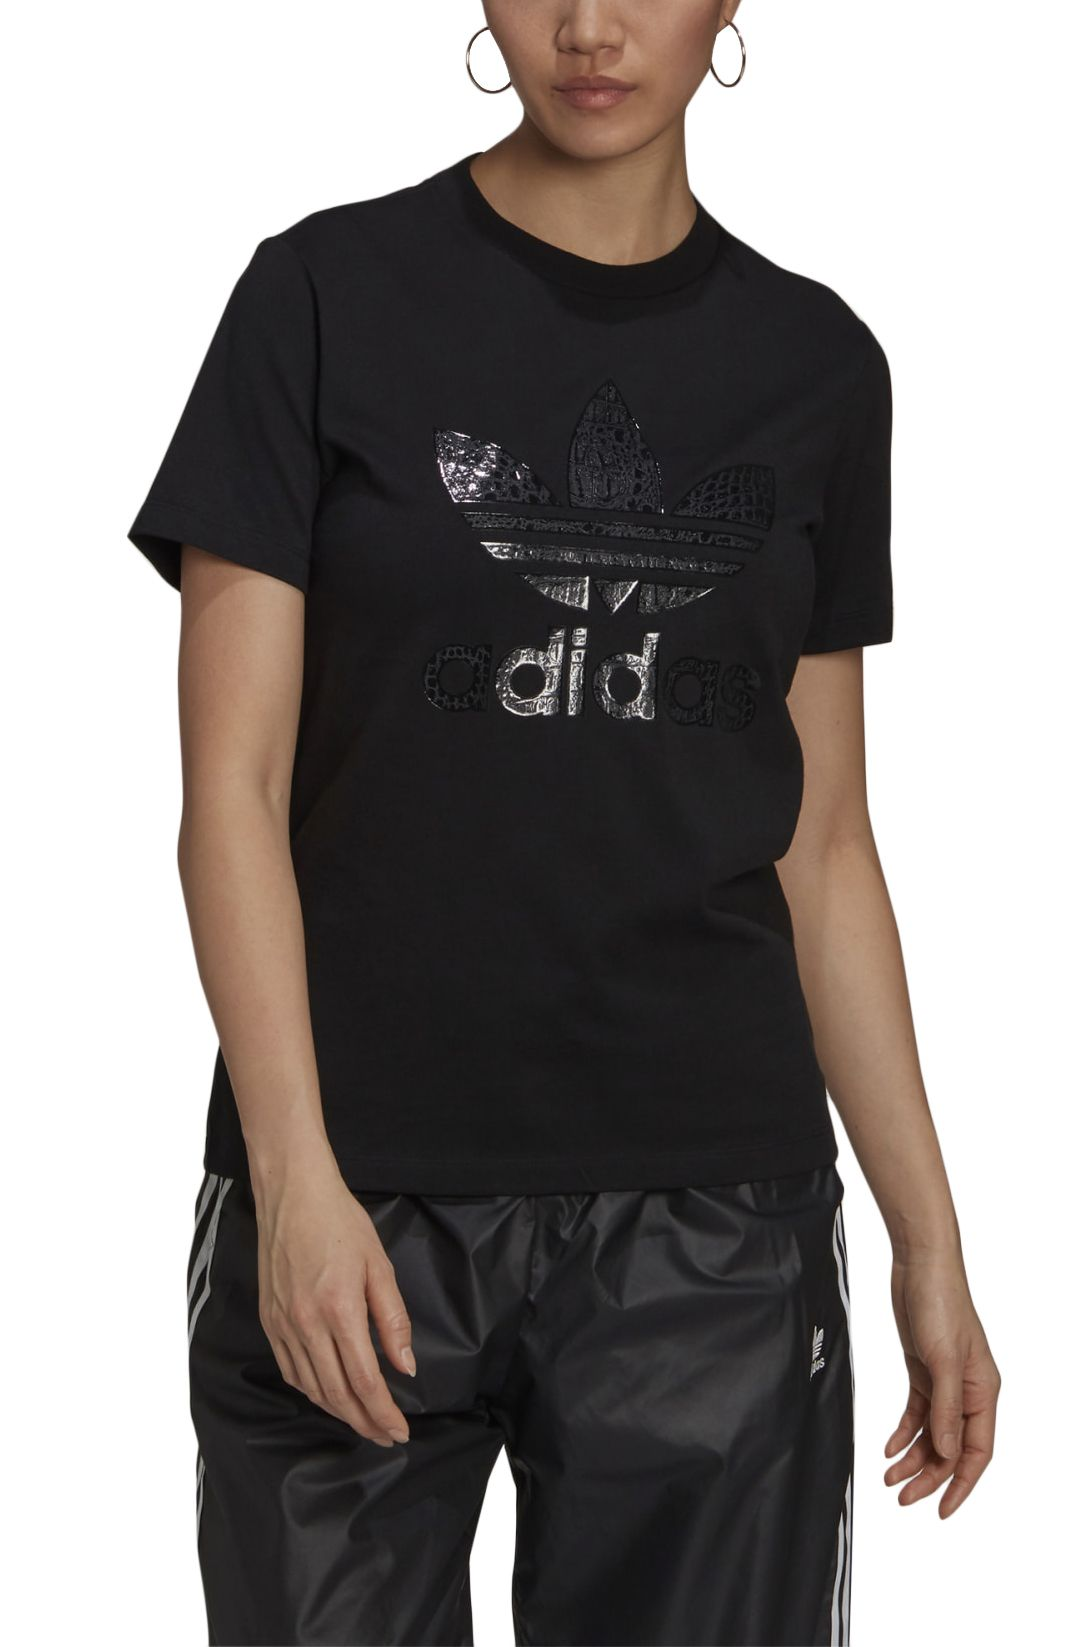 Adidas T-Shirt TEE Black